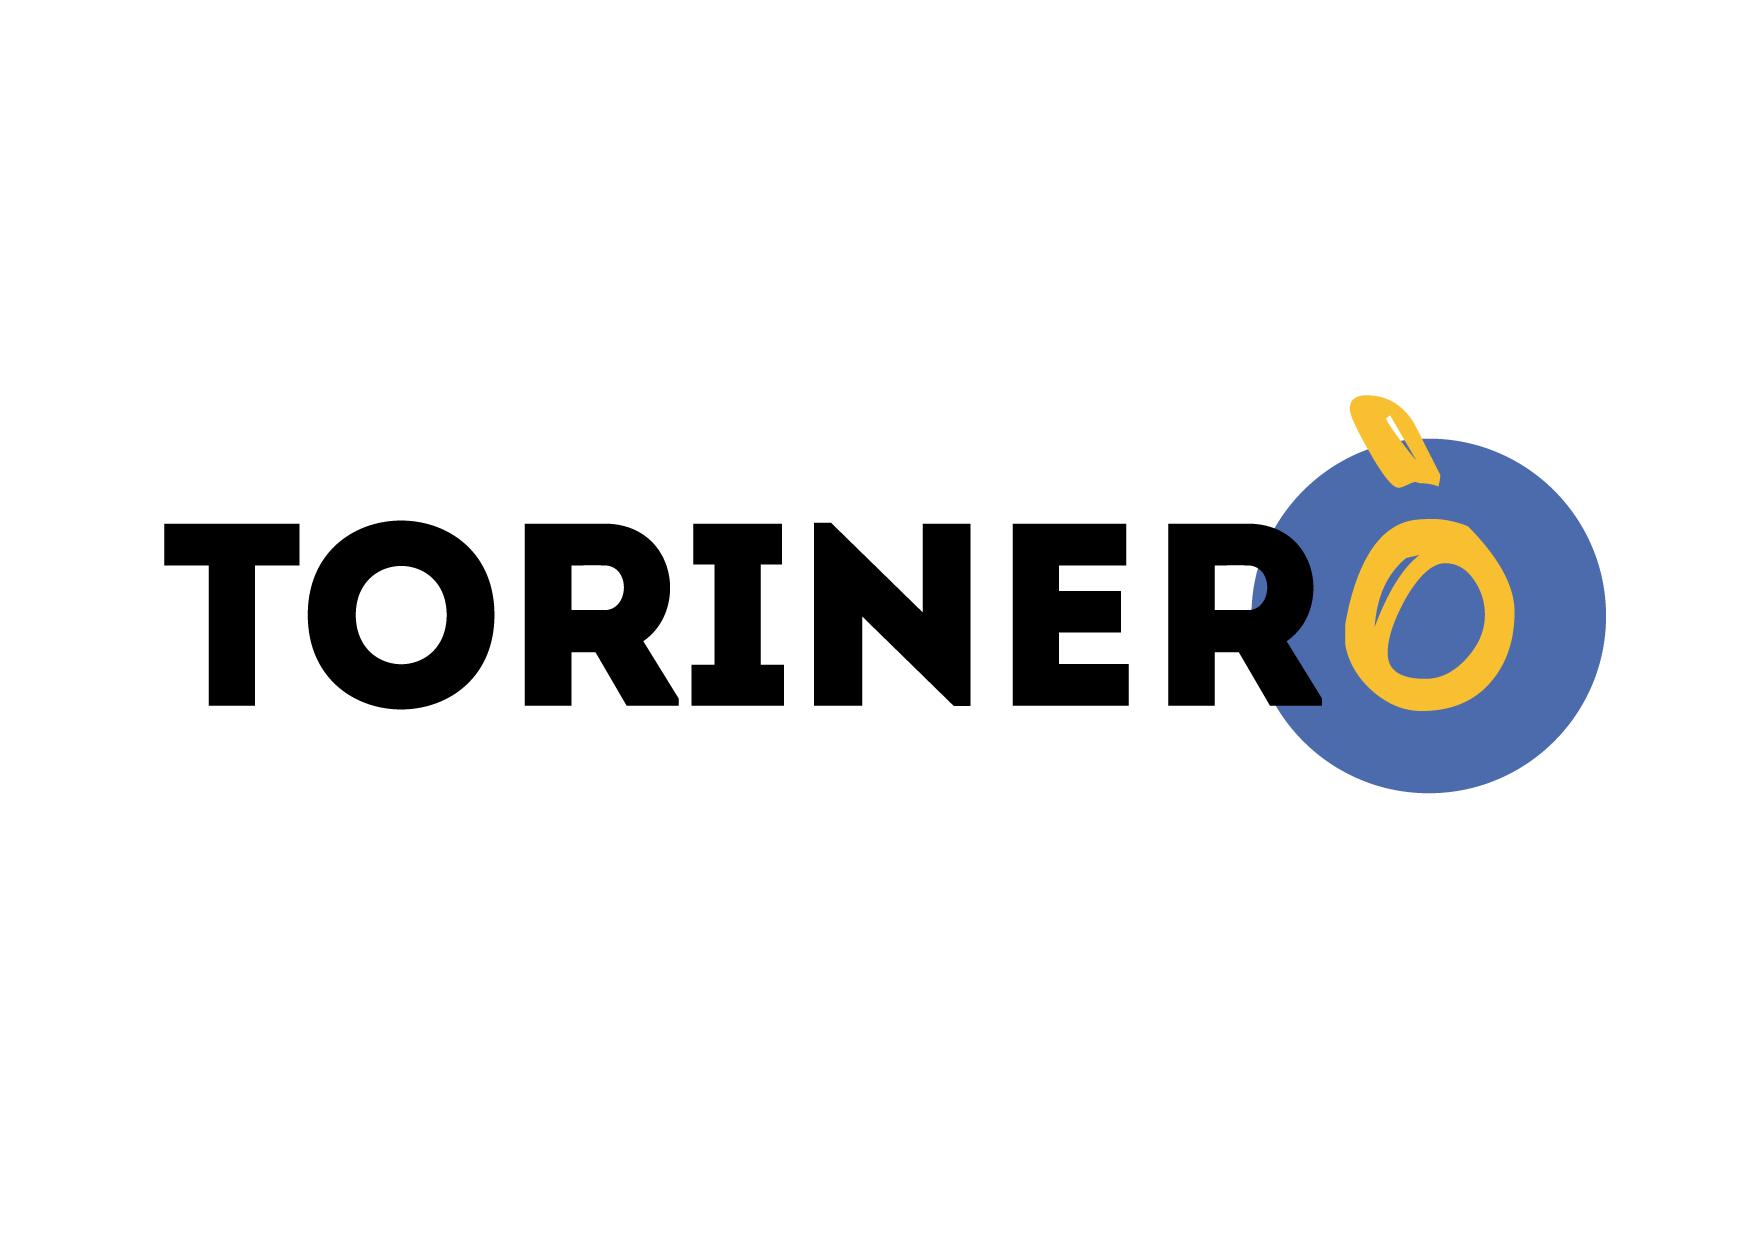 Logo di Torinerò